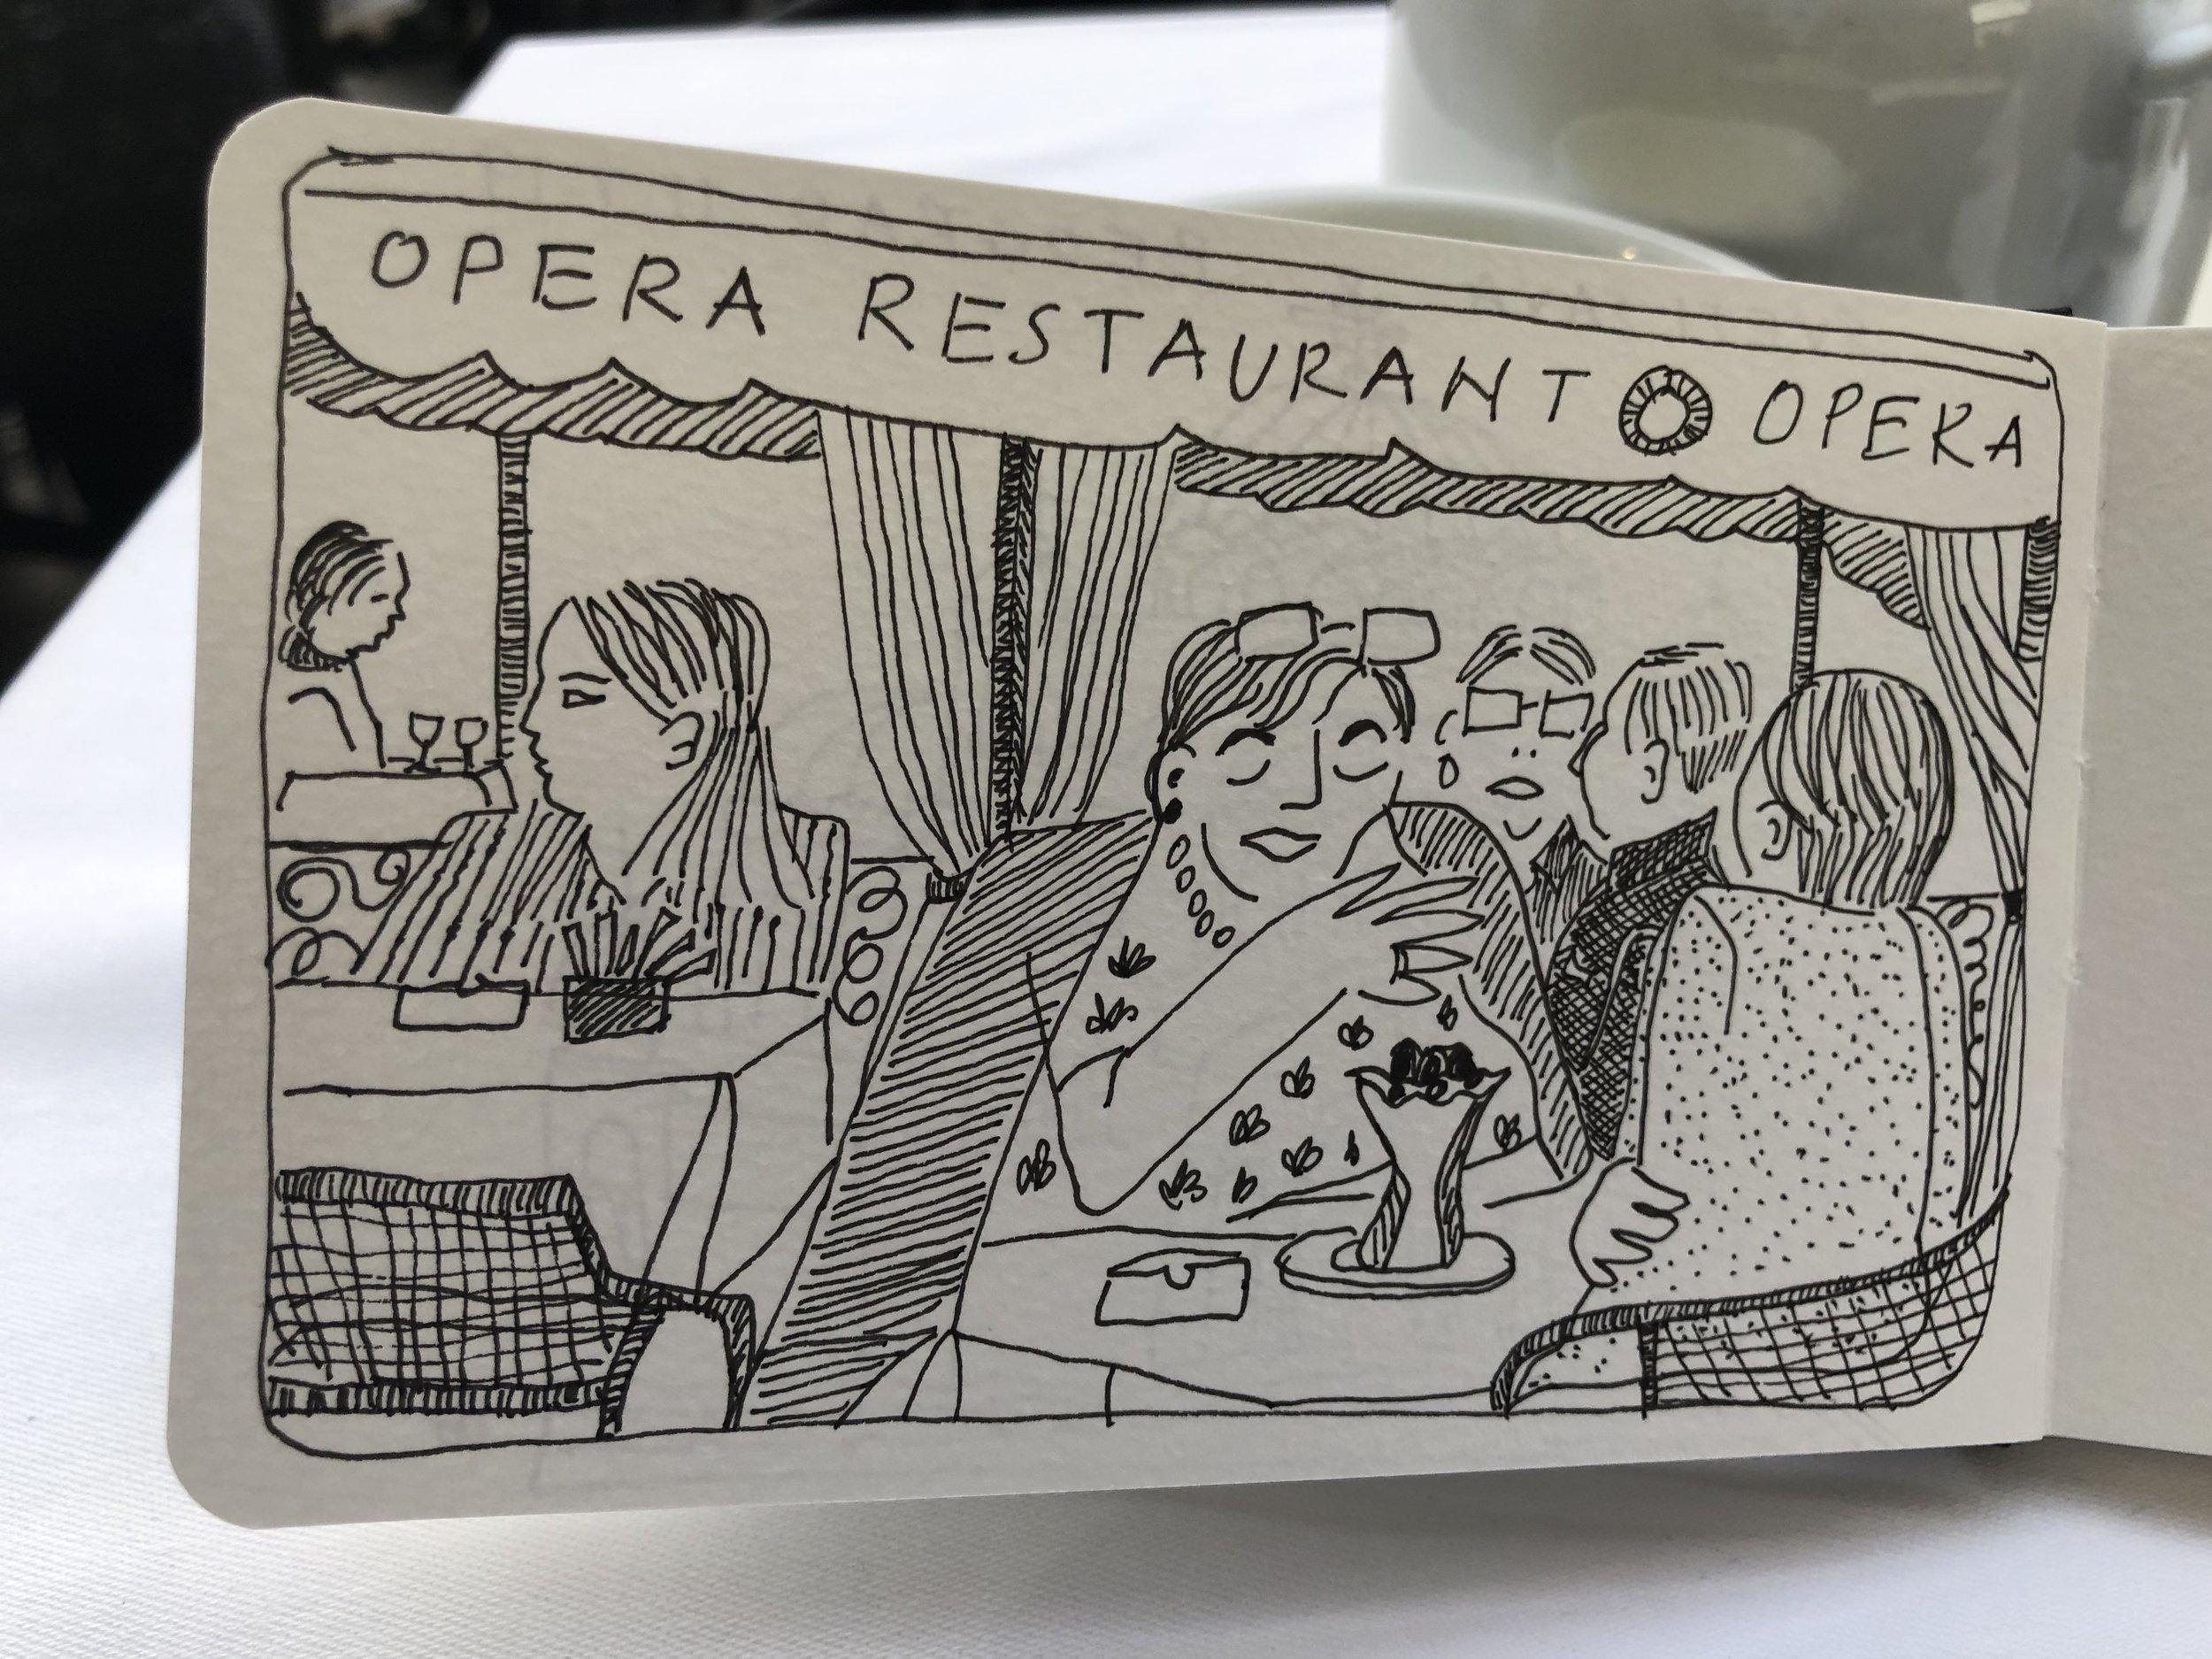 Opera Restaurant